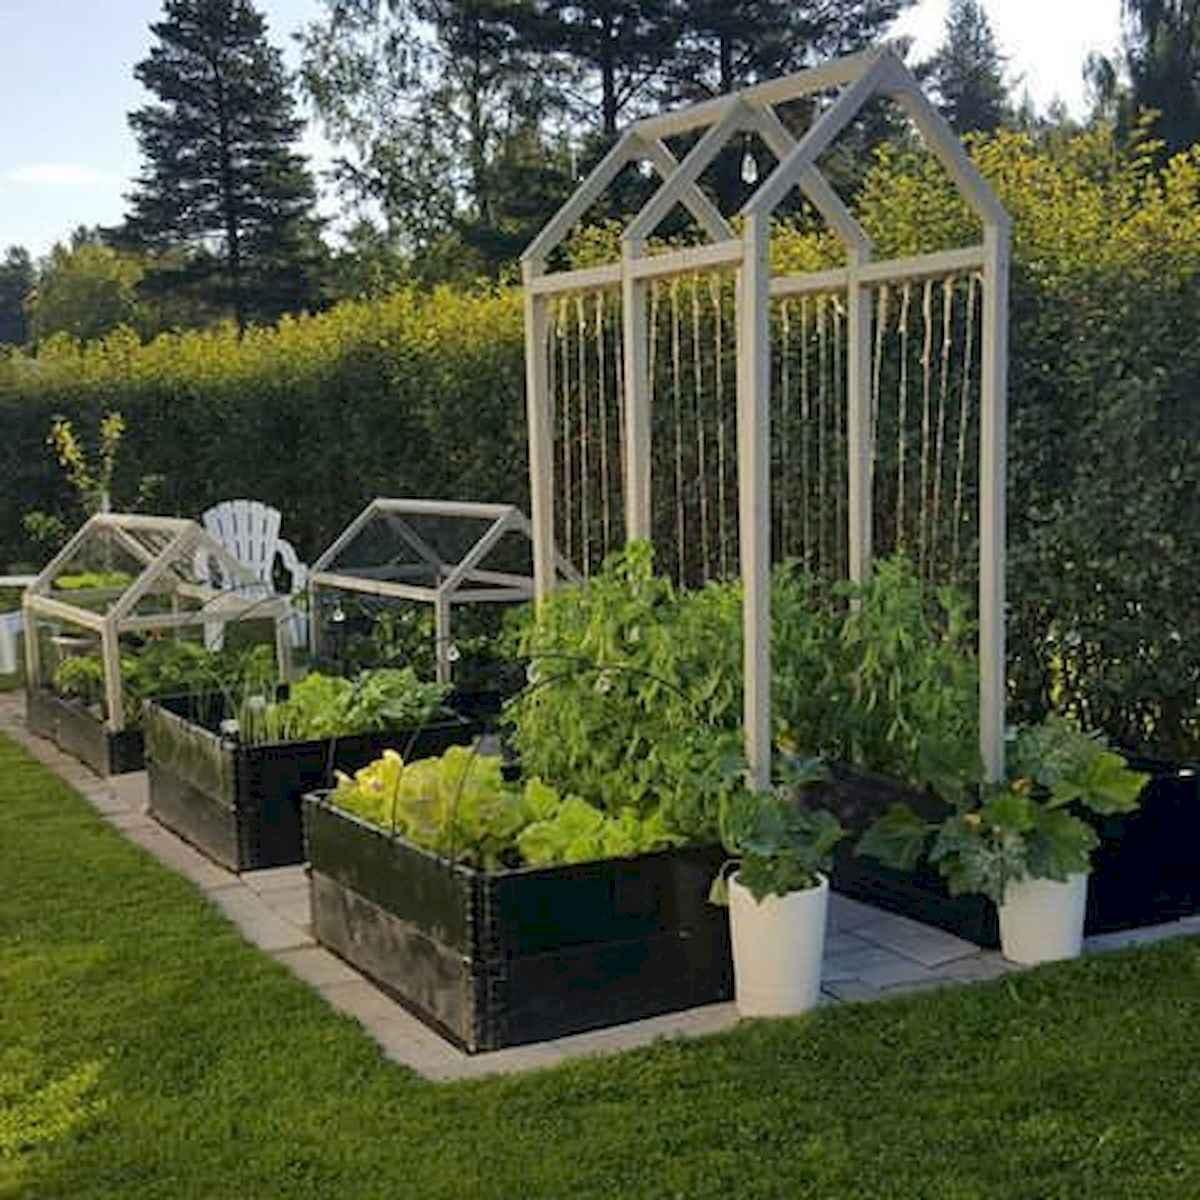 55 Favorite Garden Boxes Raised Design Ideas (40)